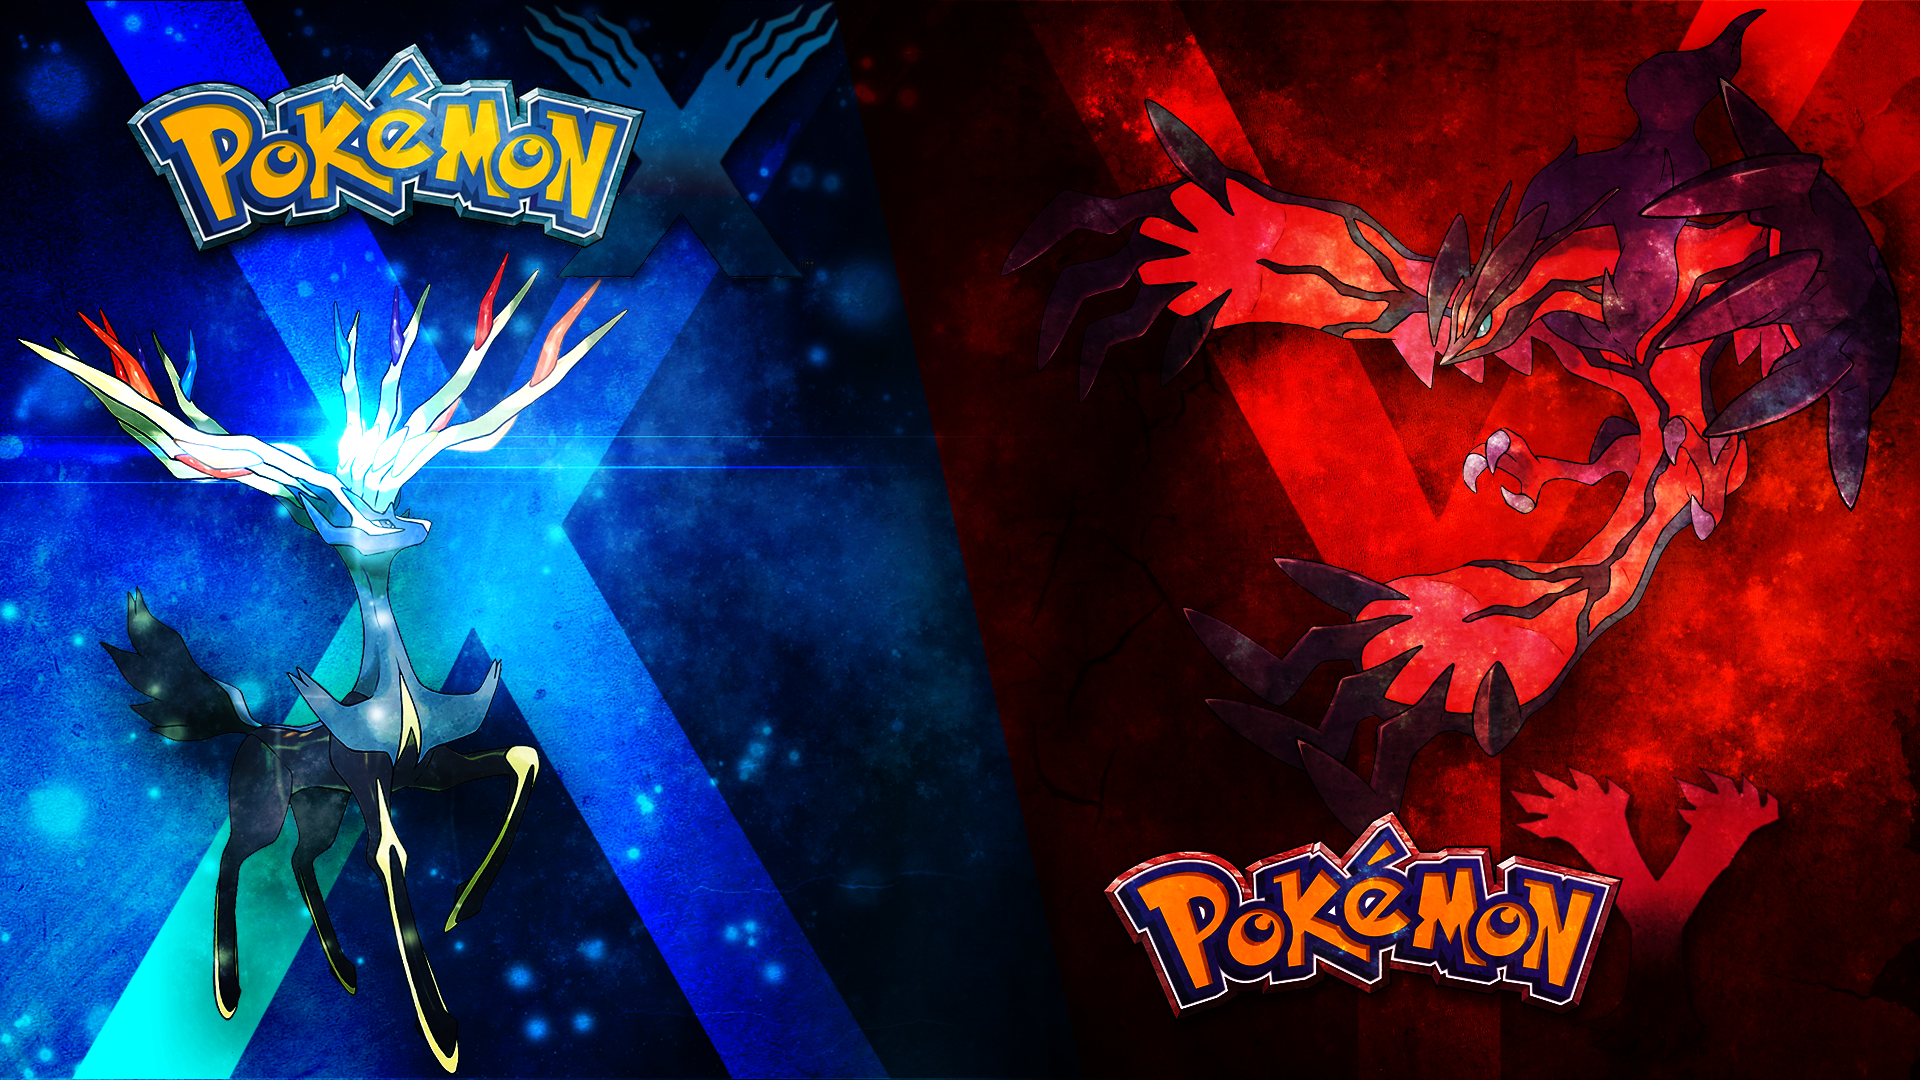 Pokemon X/Y Wallpaper by DarkiGFX